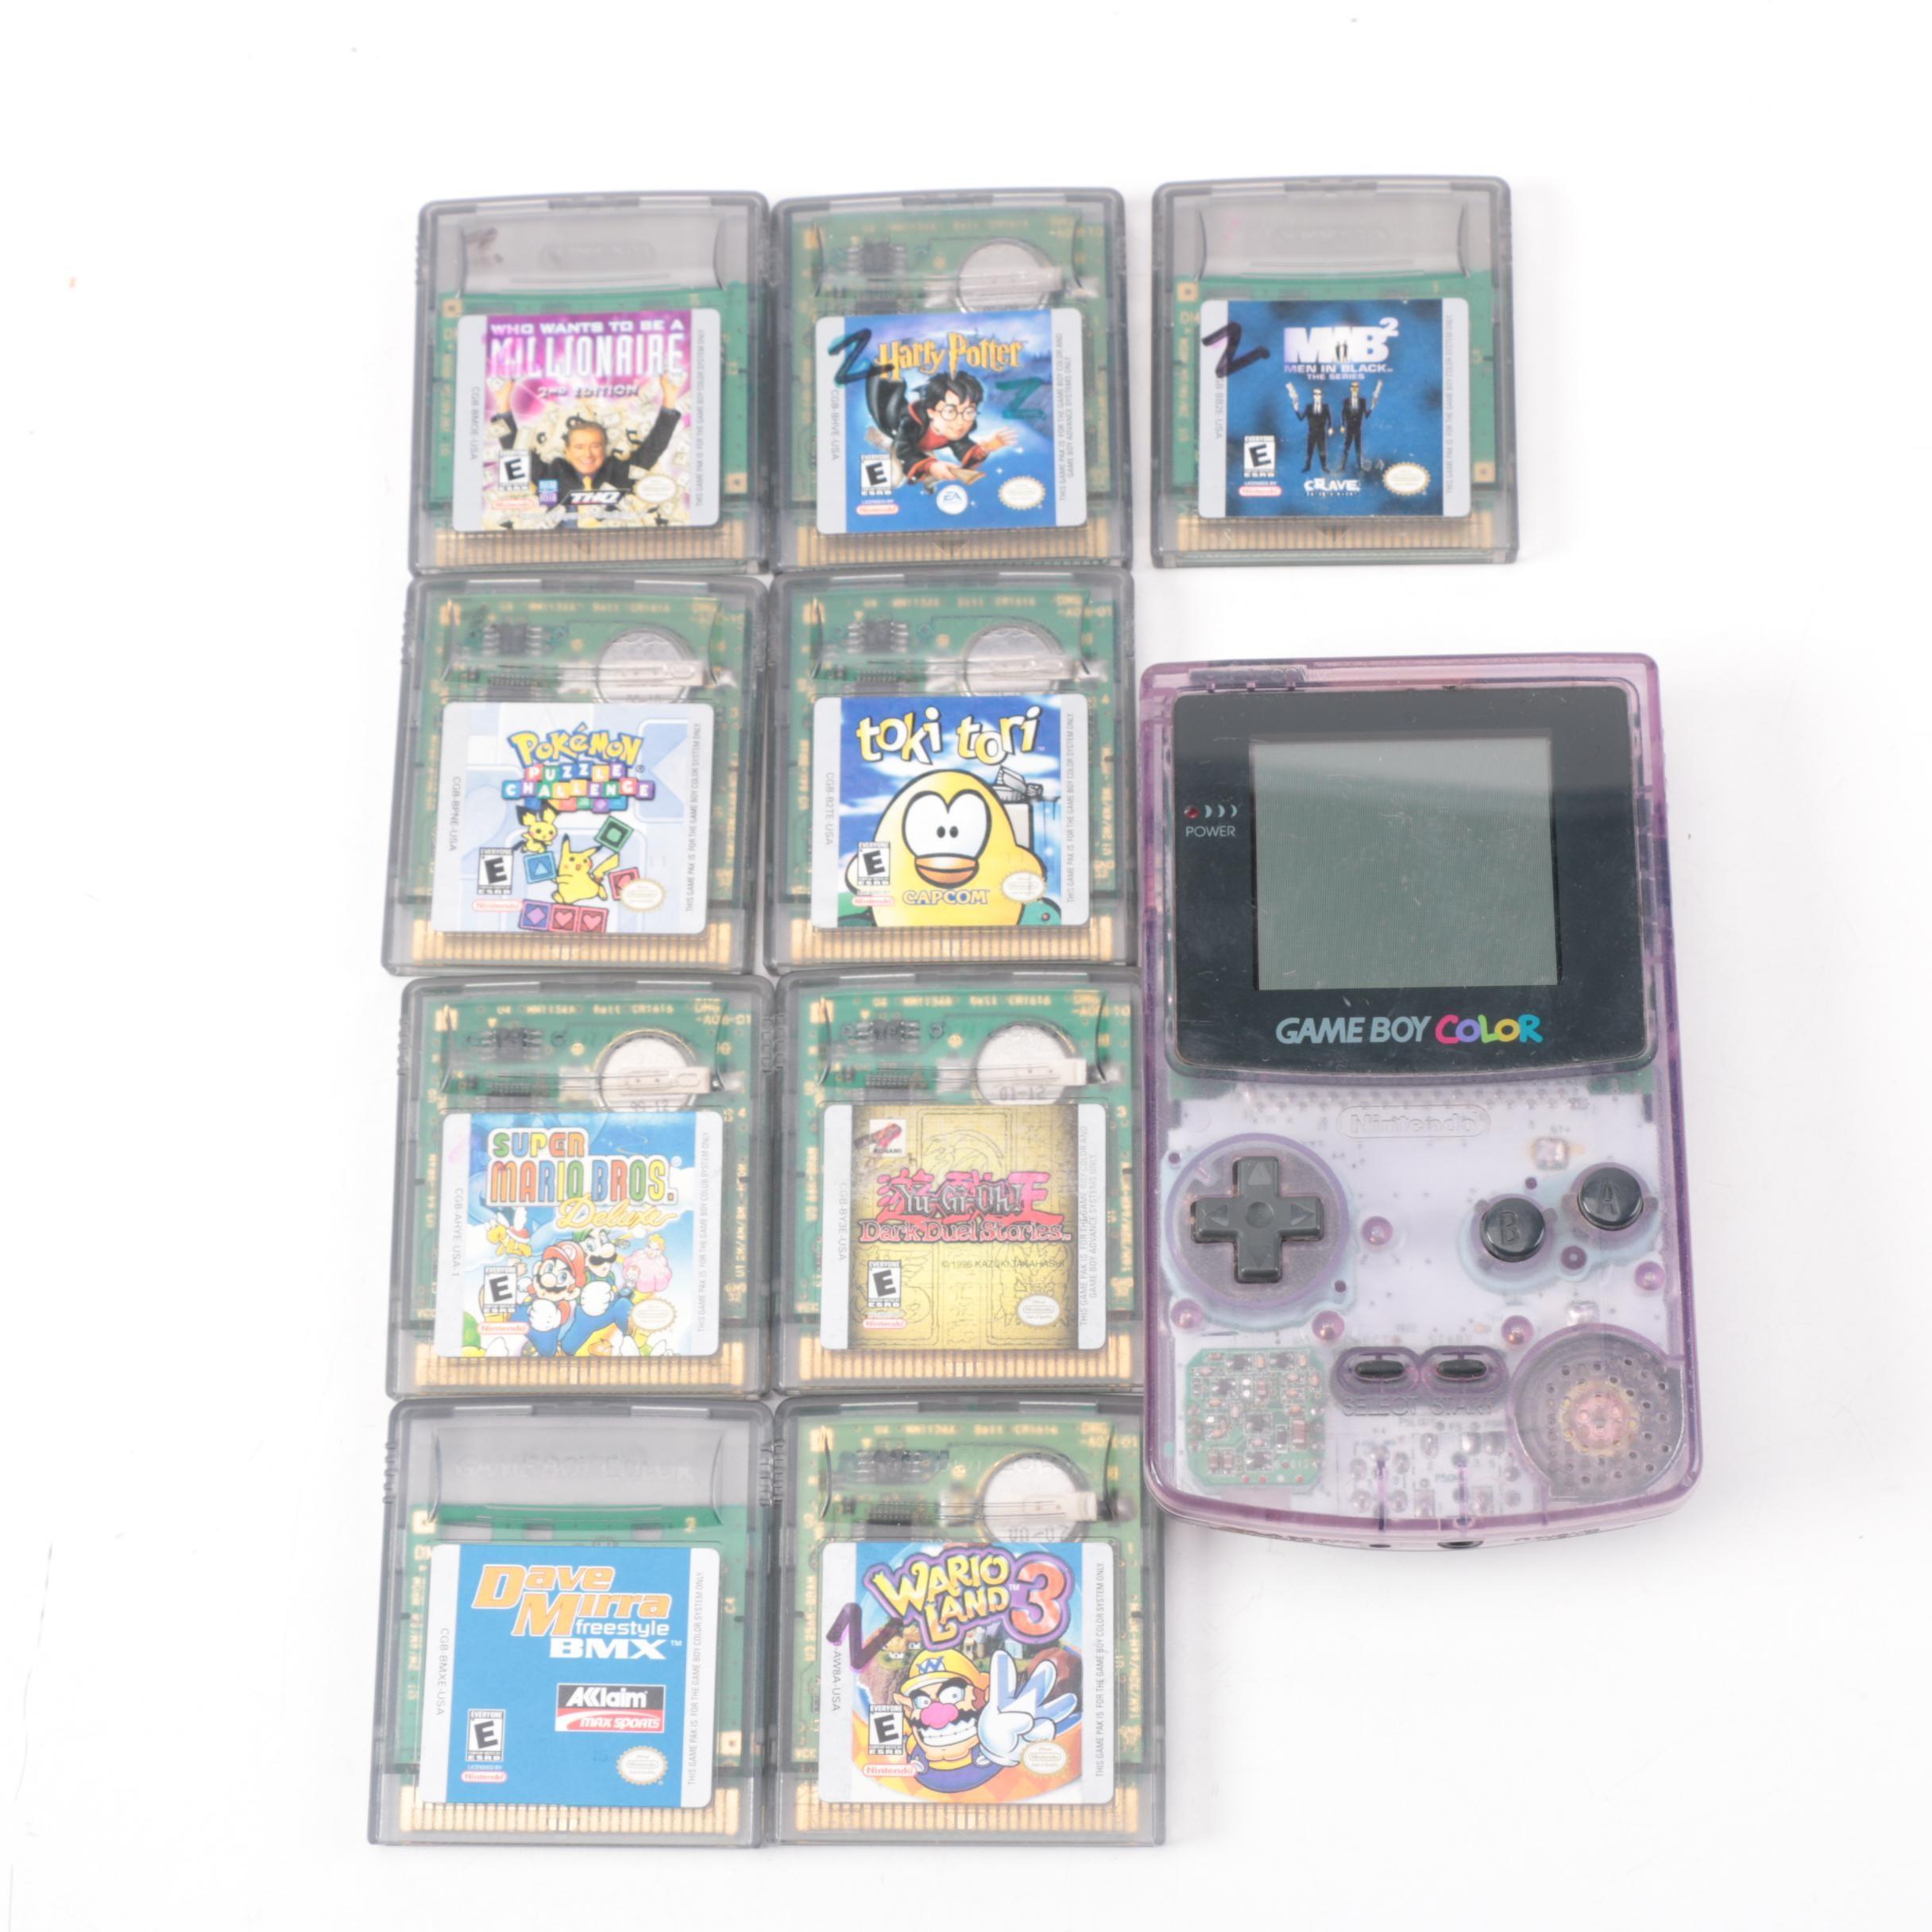 Nintendo Game Boy Color with Games